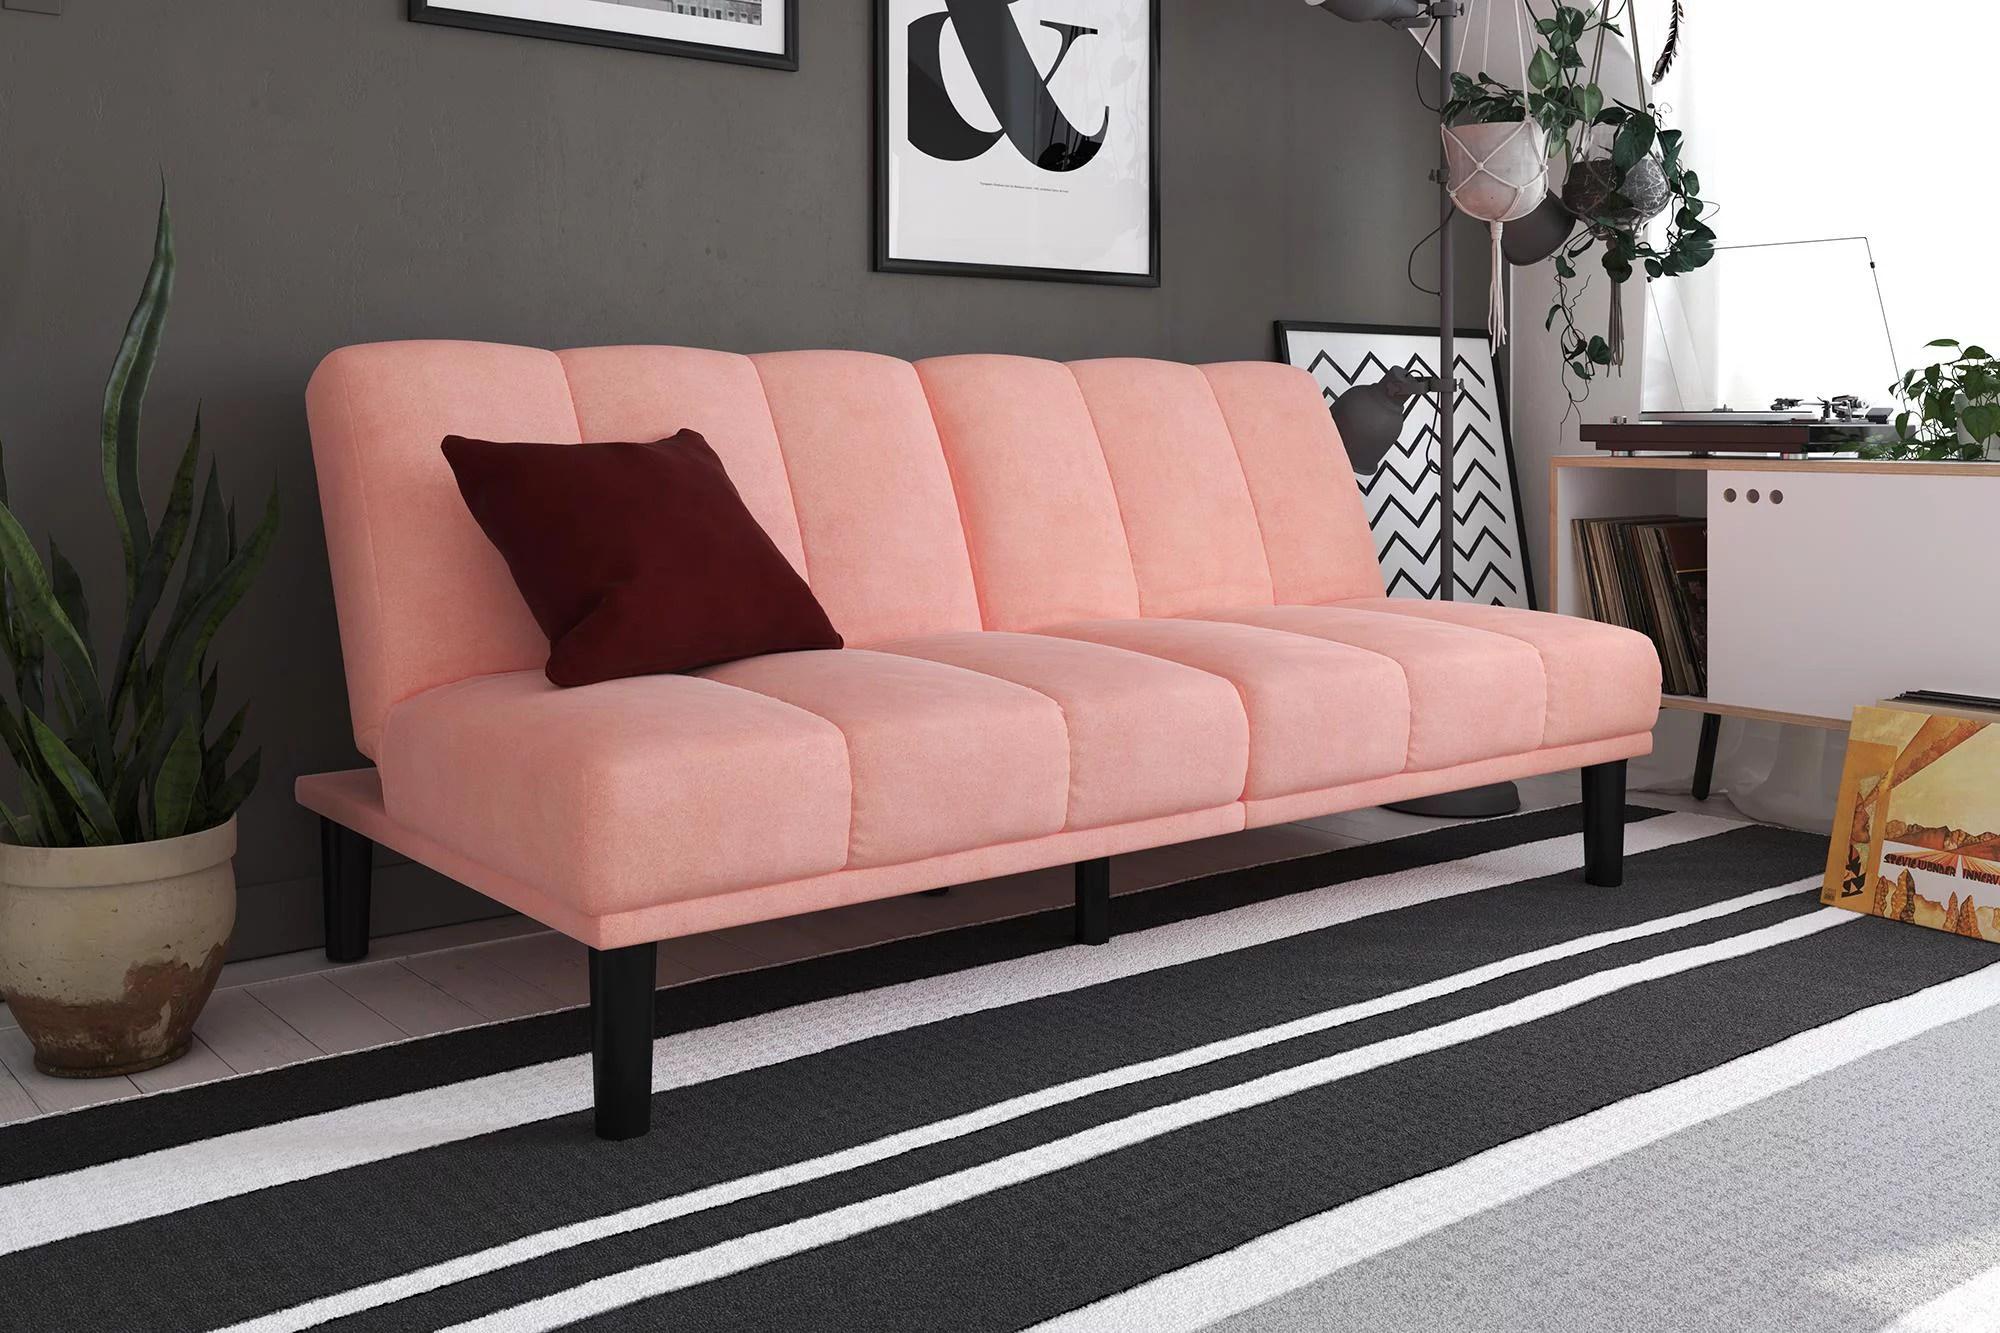 mainstays channel cushion futon multiple colors